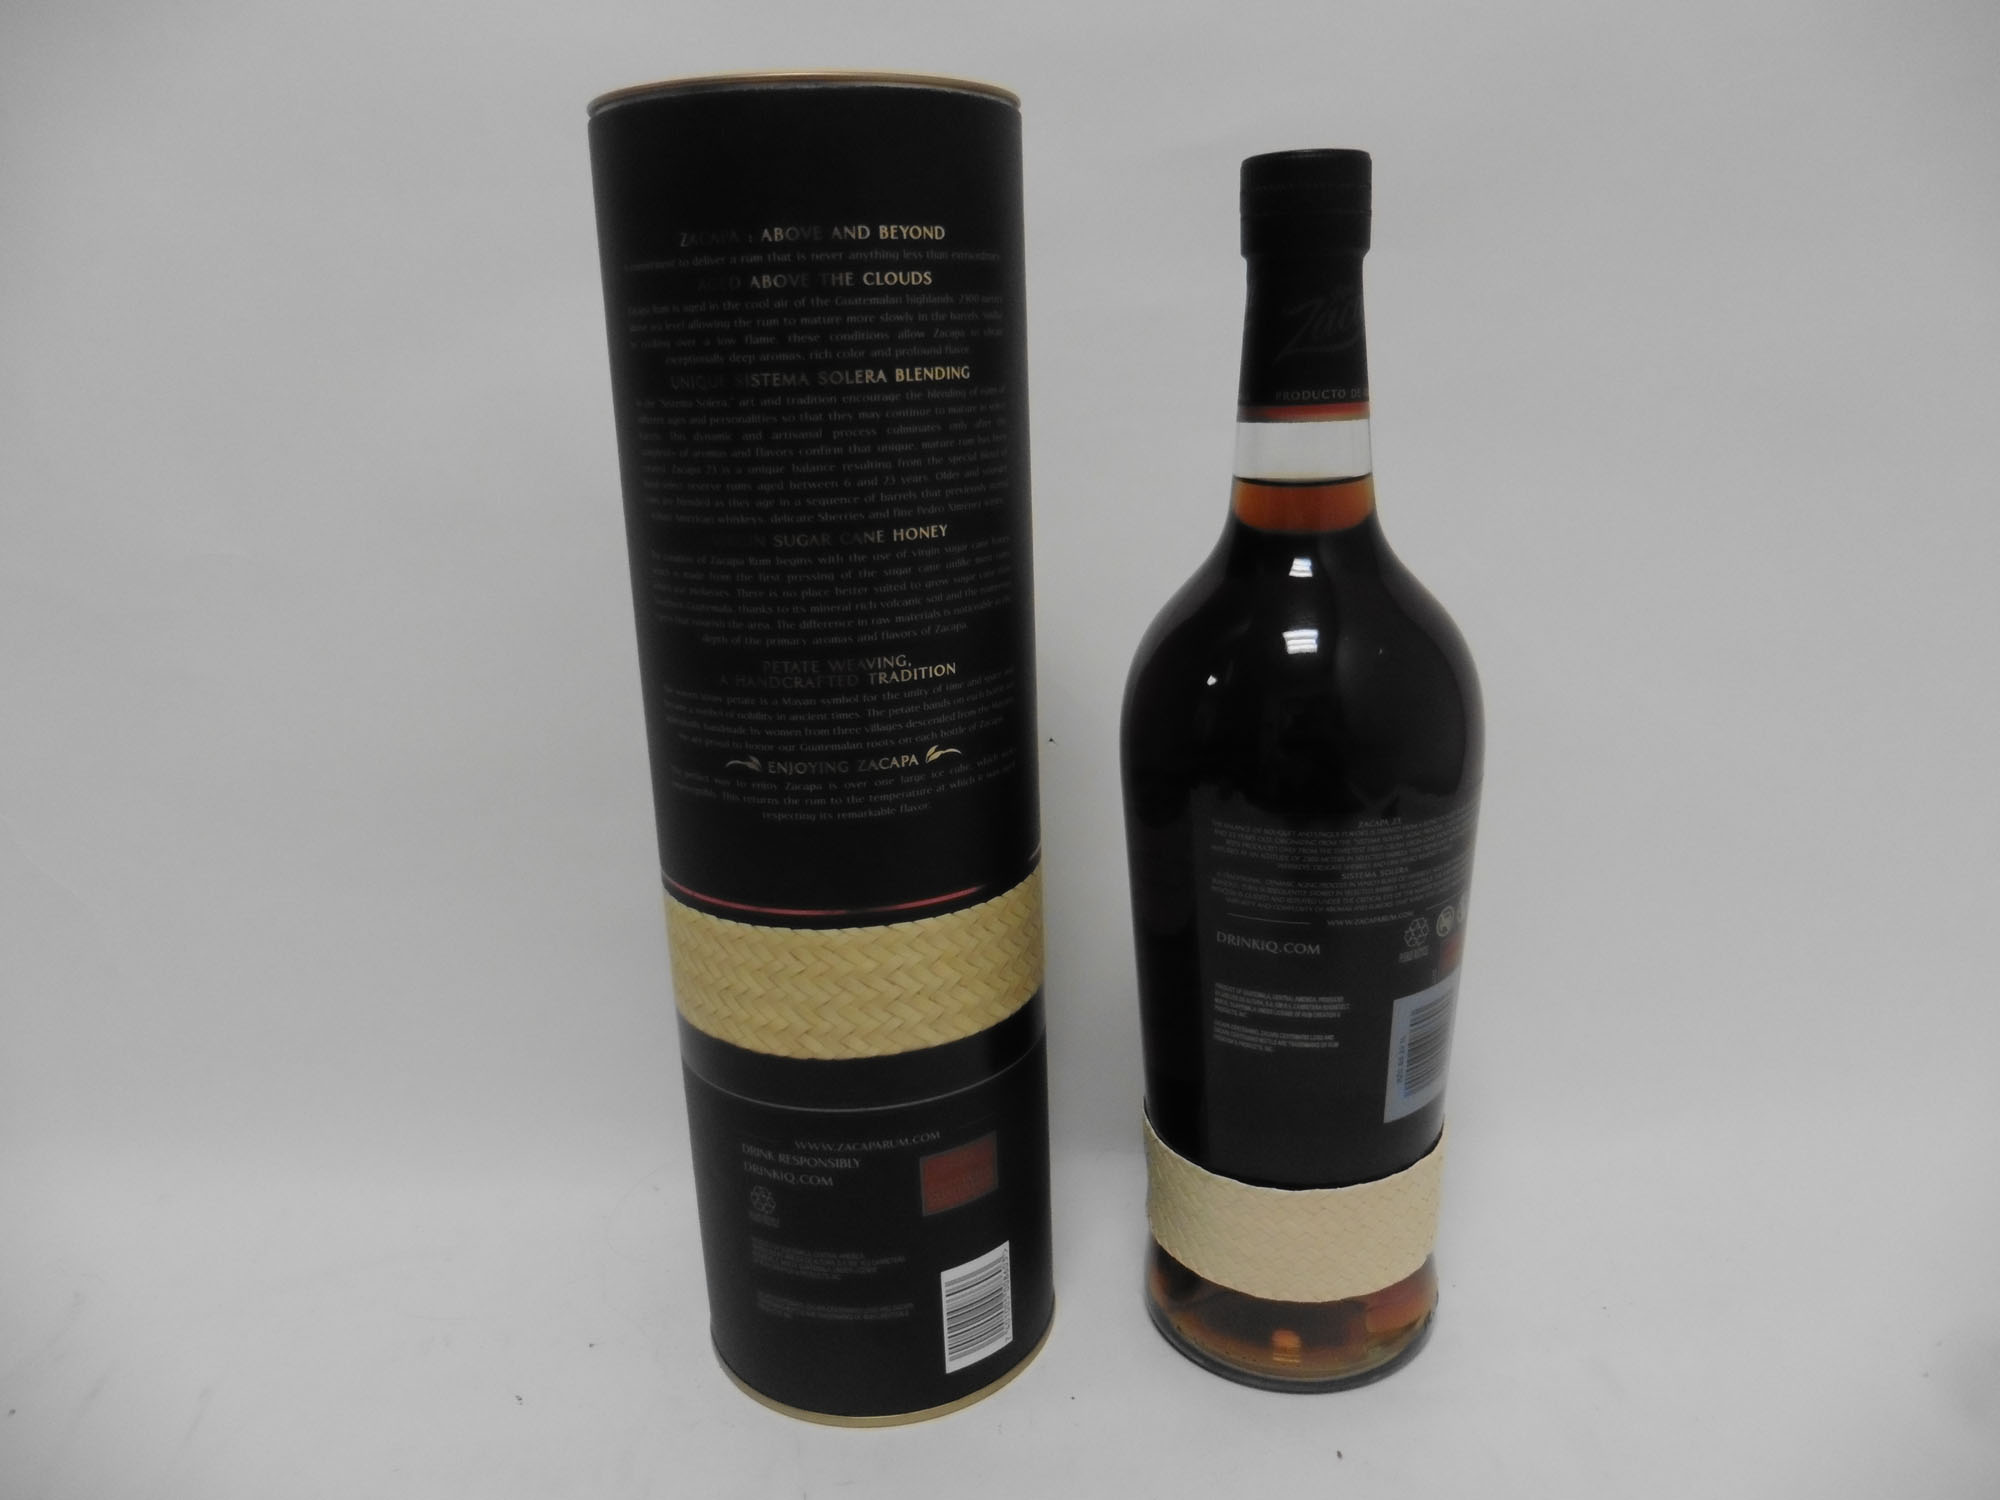 A bottle of Ron Zacapa Centenario Sistema 23 Solera Gran Reserva Rum from Guatemala with carton 1 - Image 2 of 2